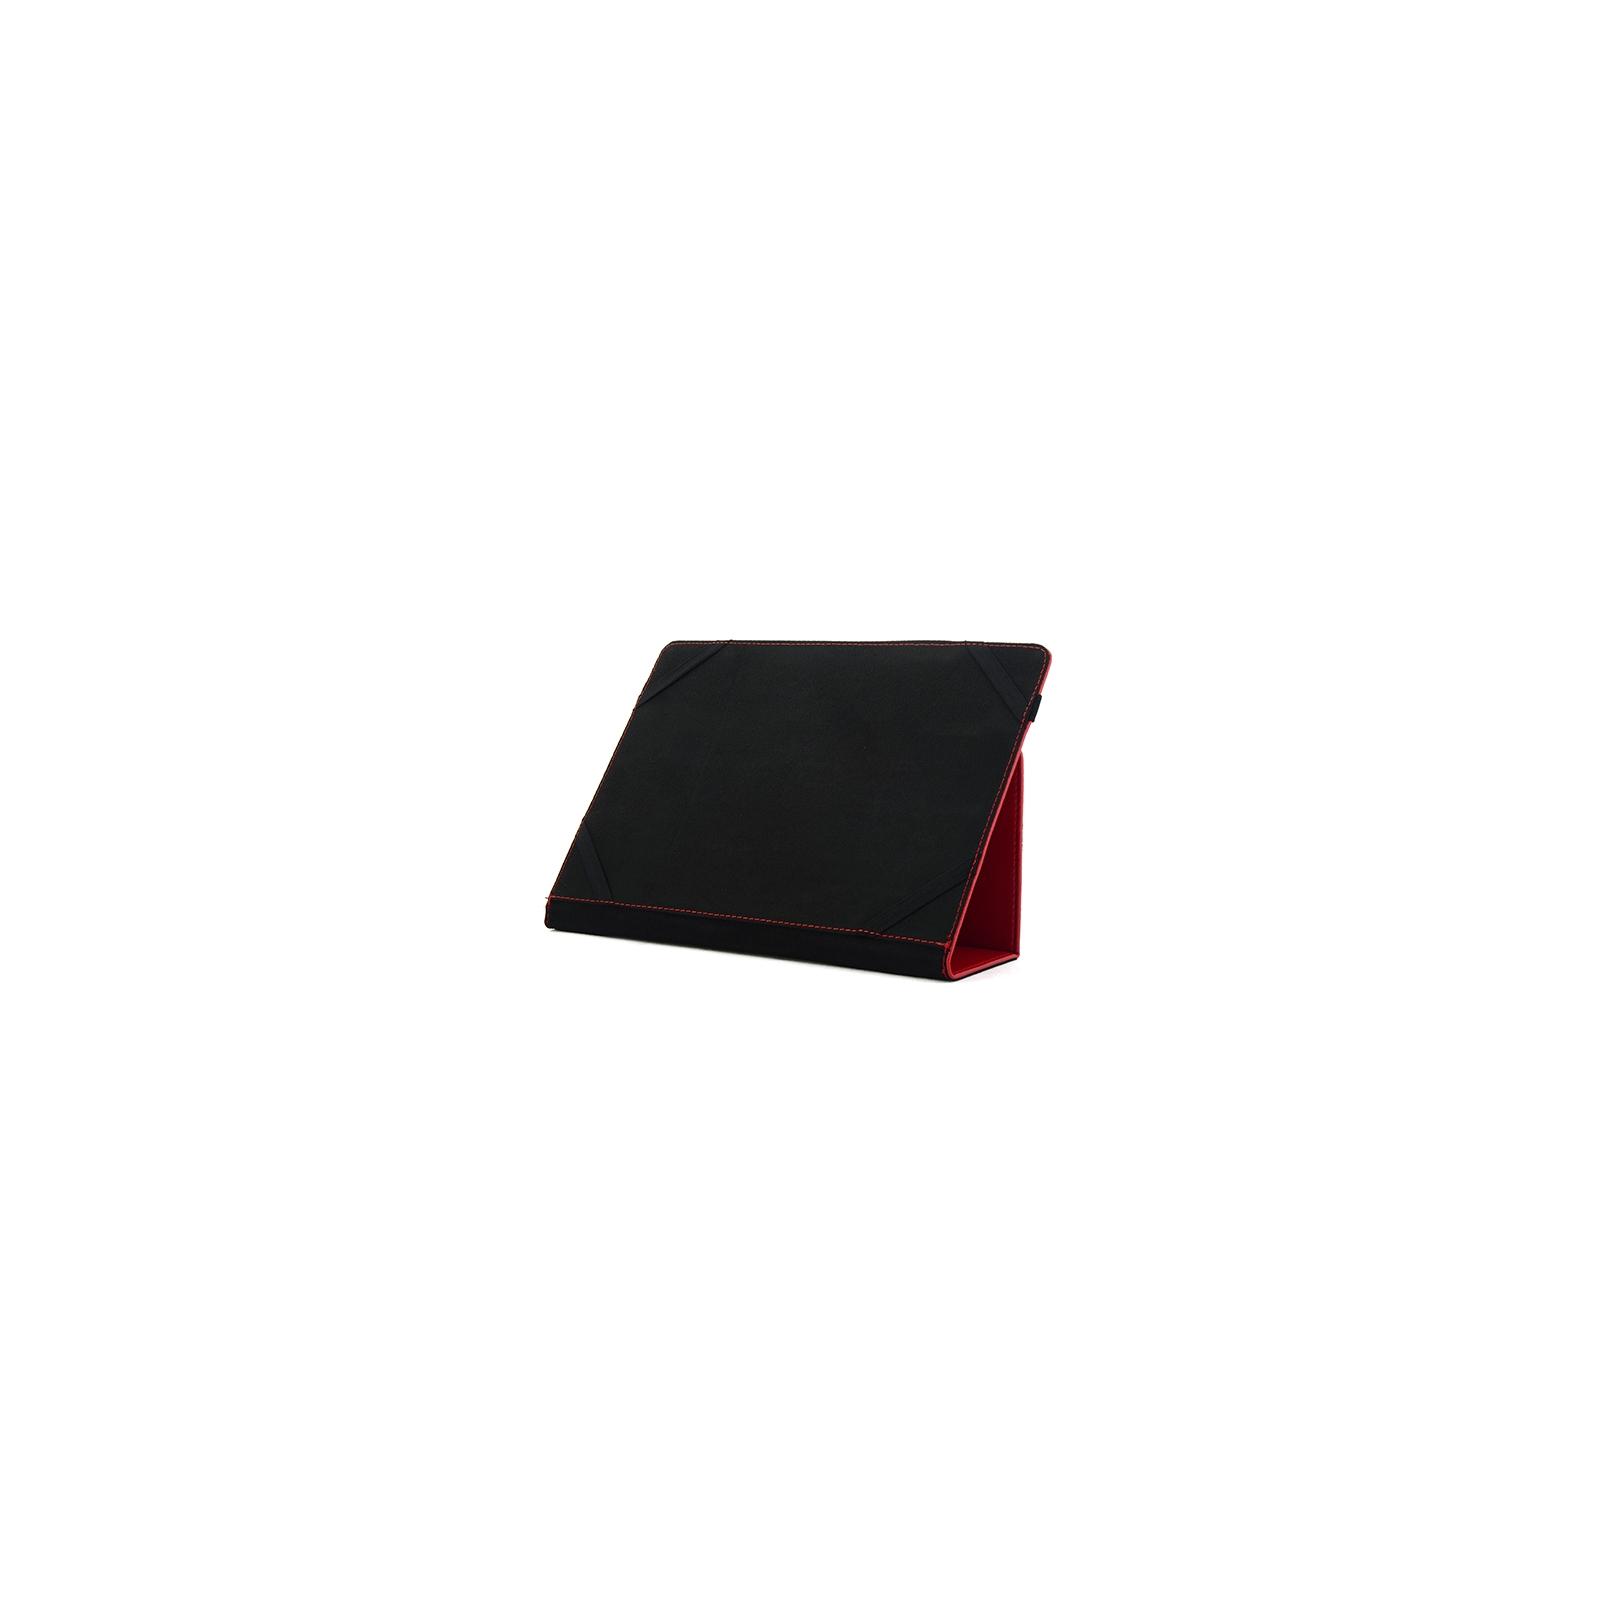 "Чехол для планшета 10""-10.1"" Cover Stand Red Drobak (216899) изображение 4"